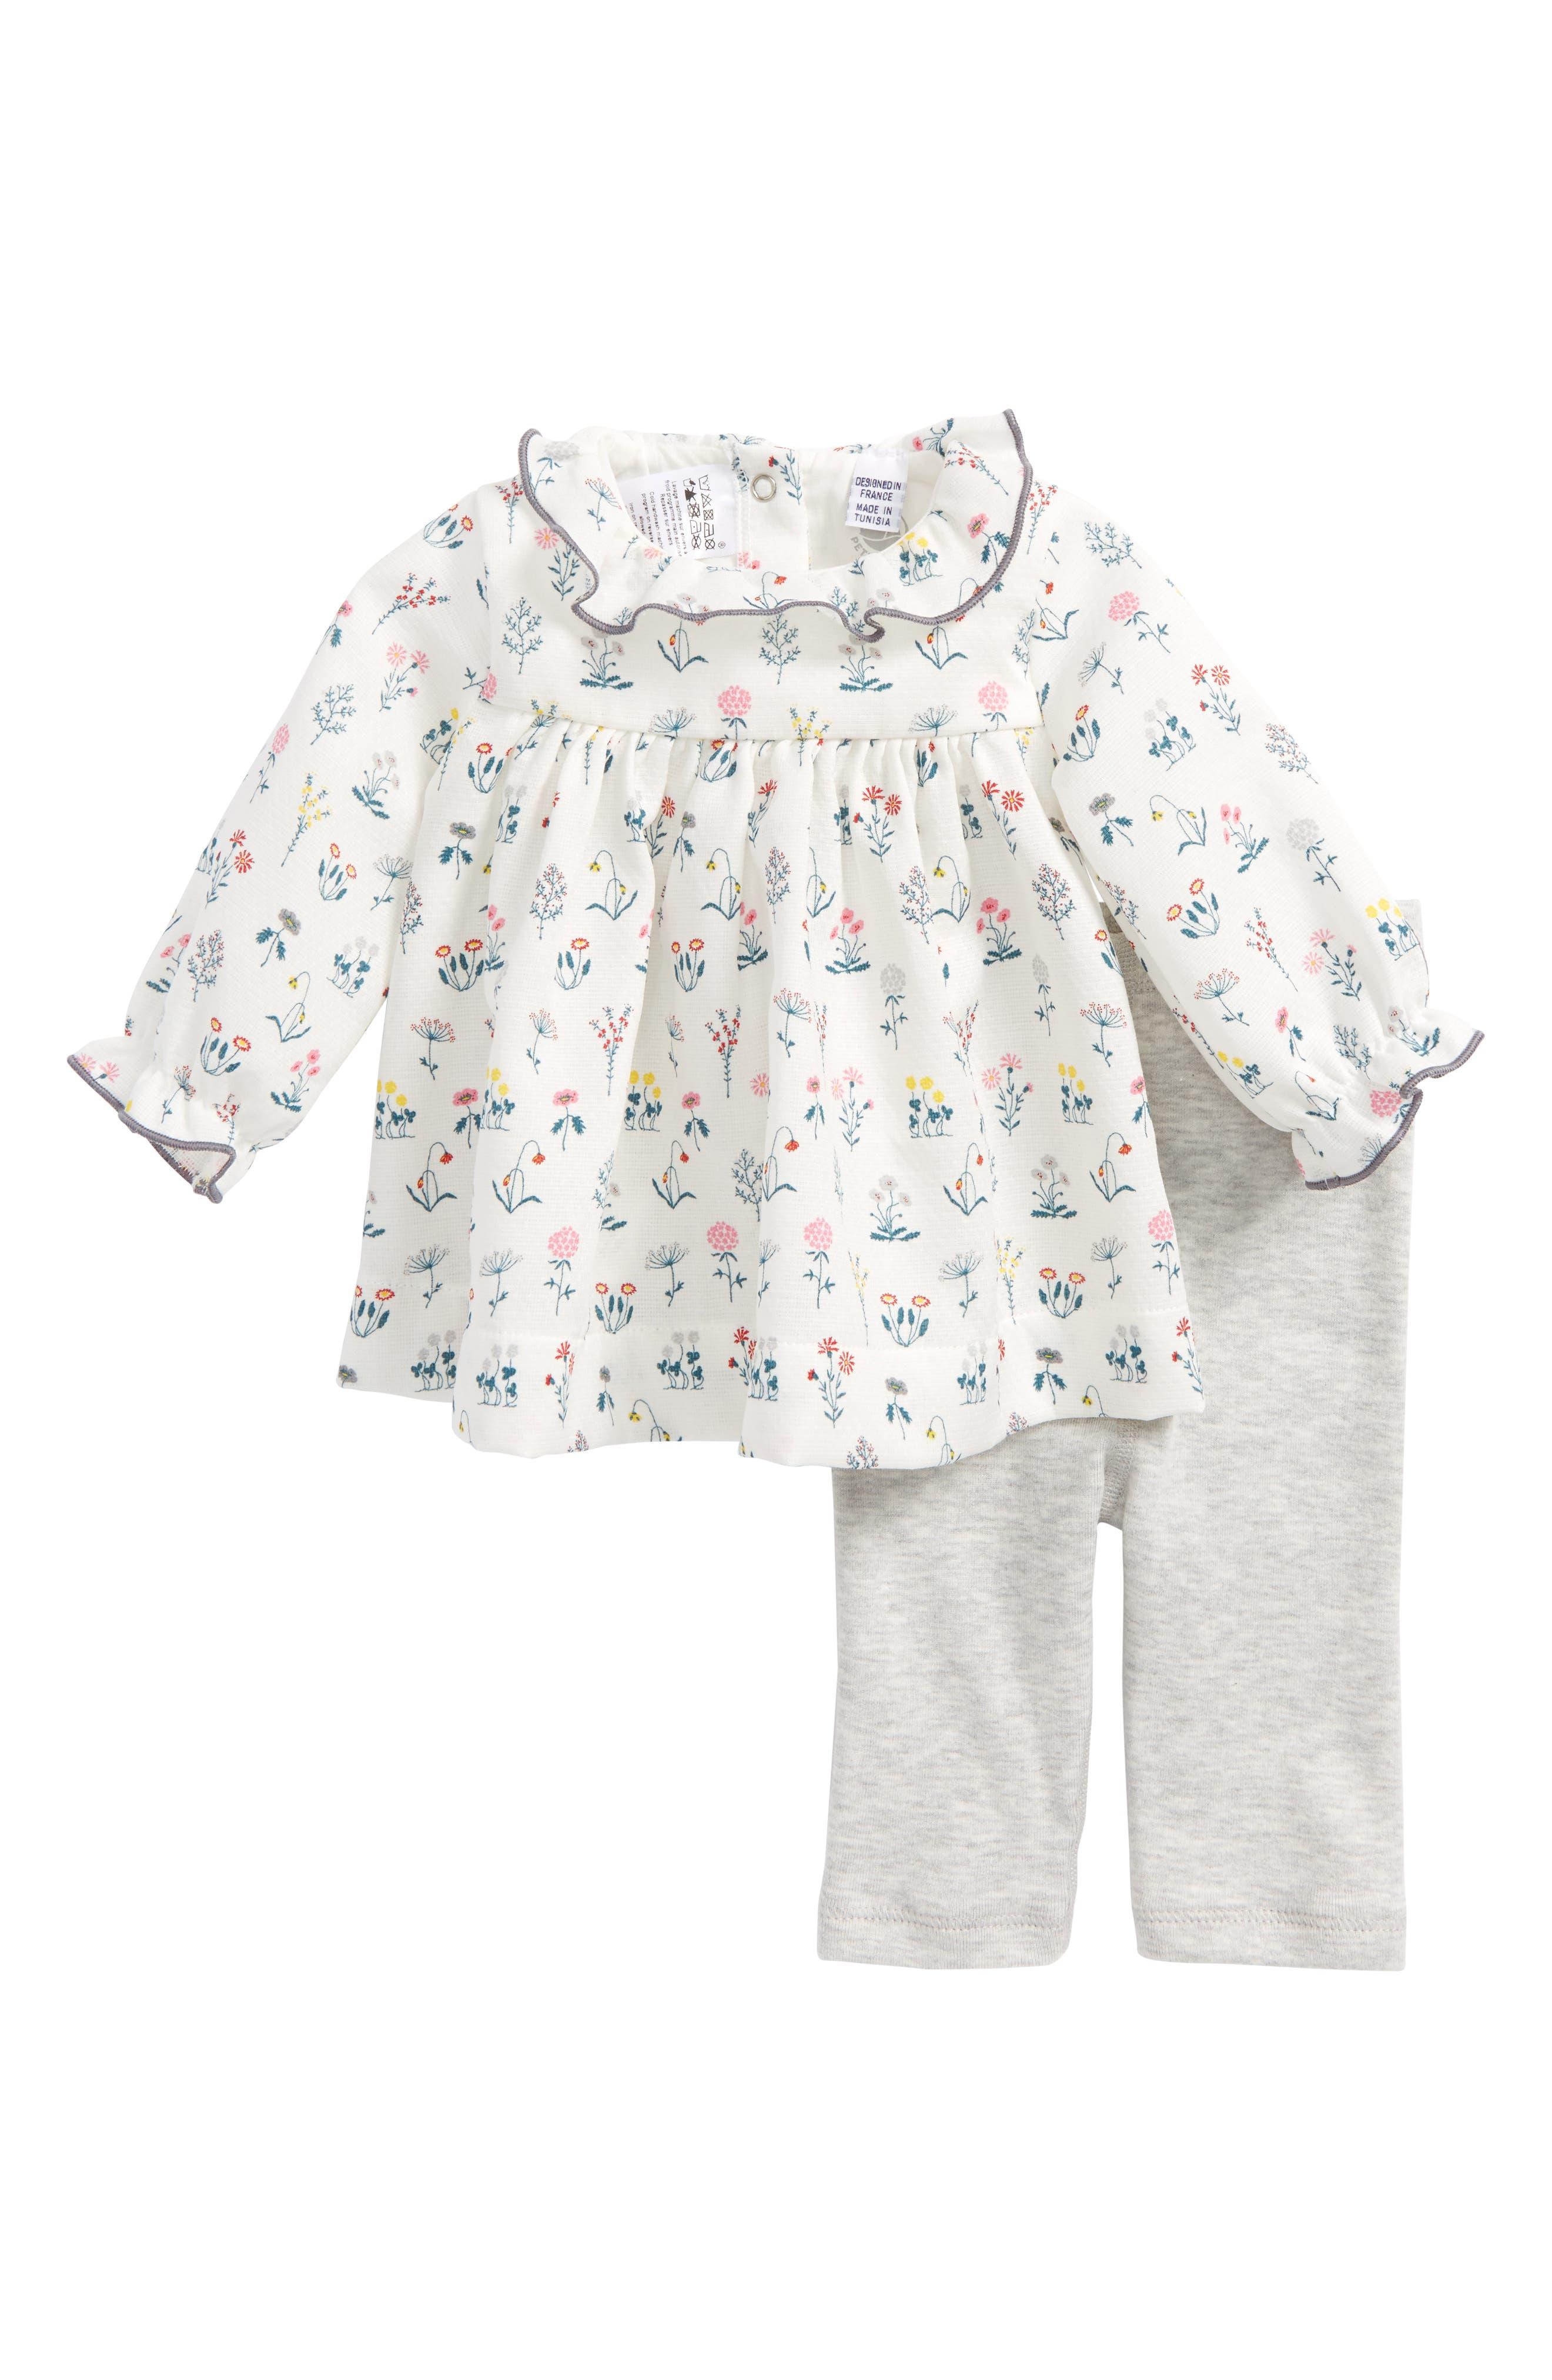 Main Image - Petit Bateau Floral Print Dress & Leggings Set (Baby Girls)